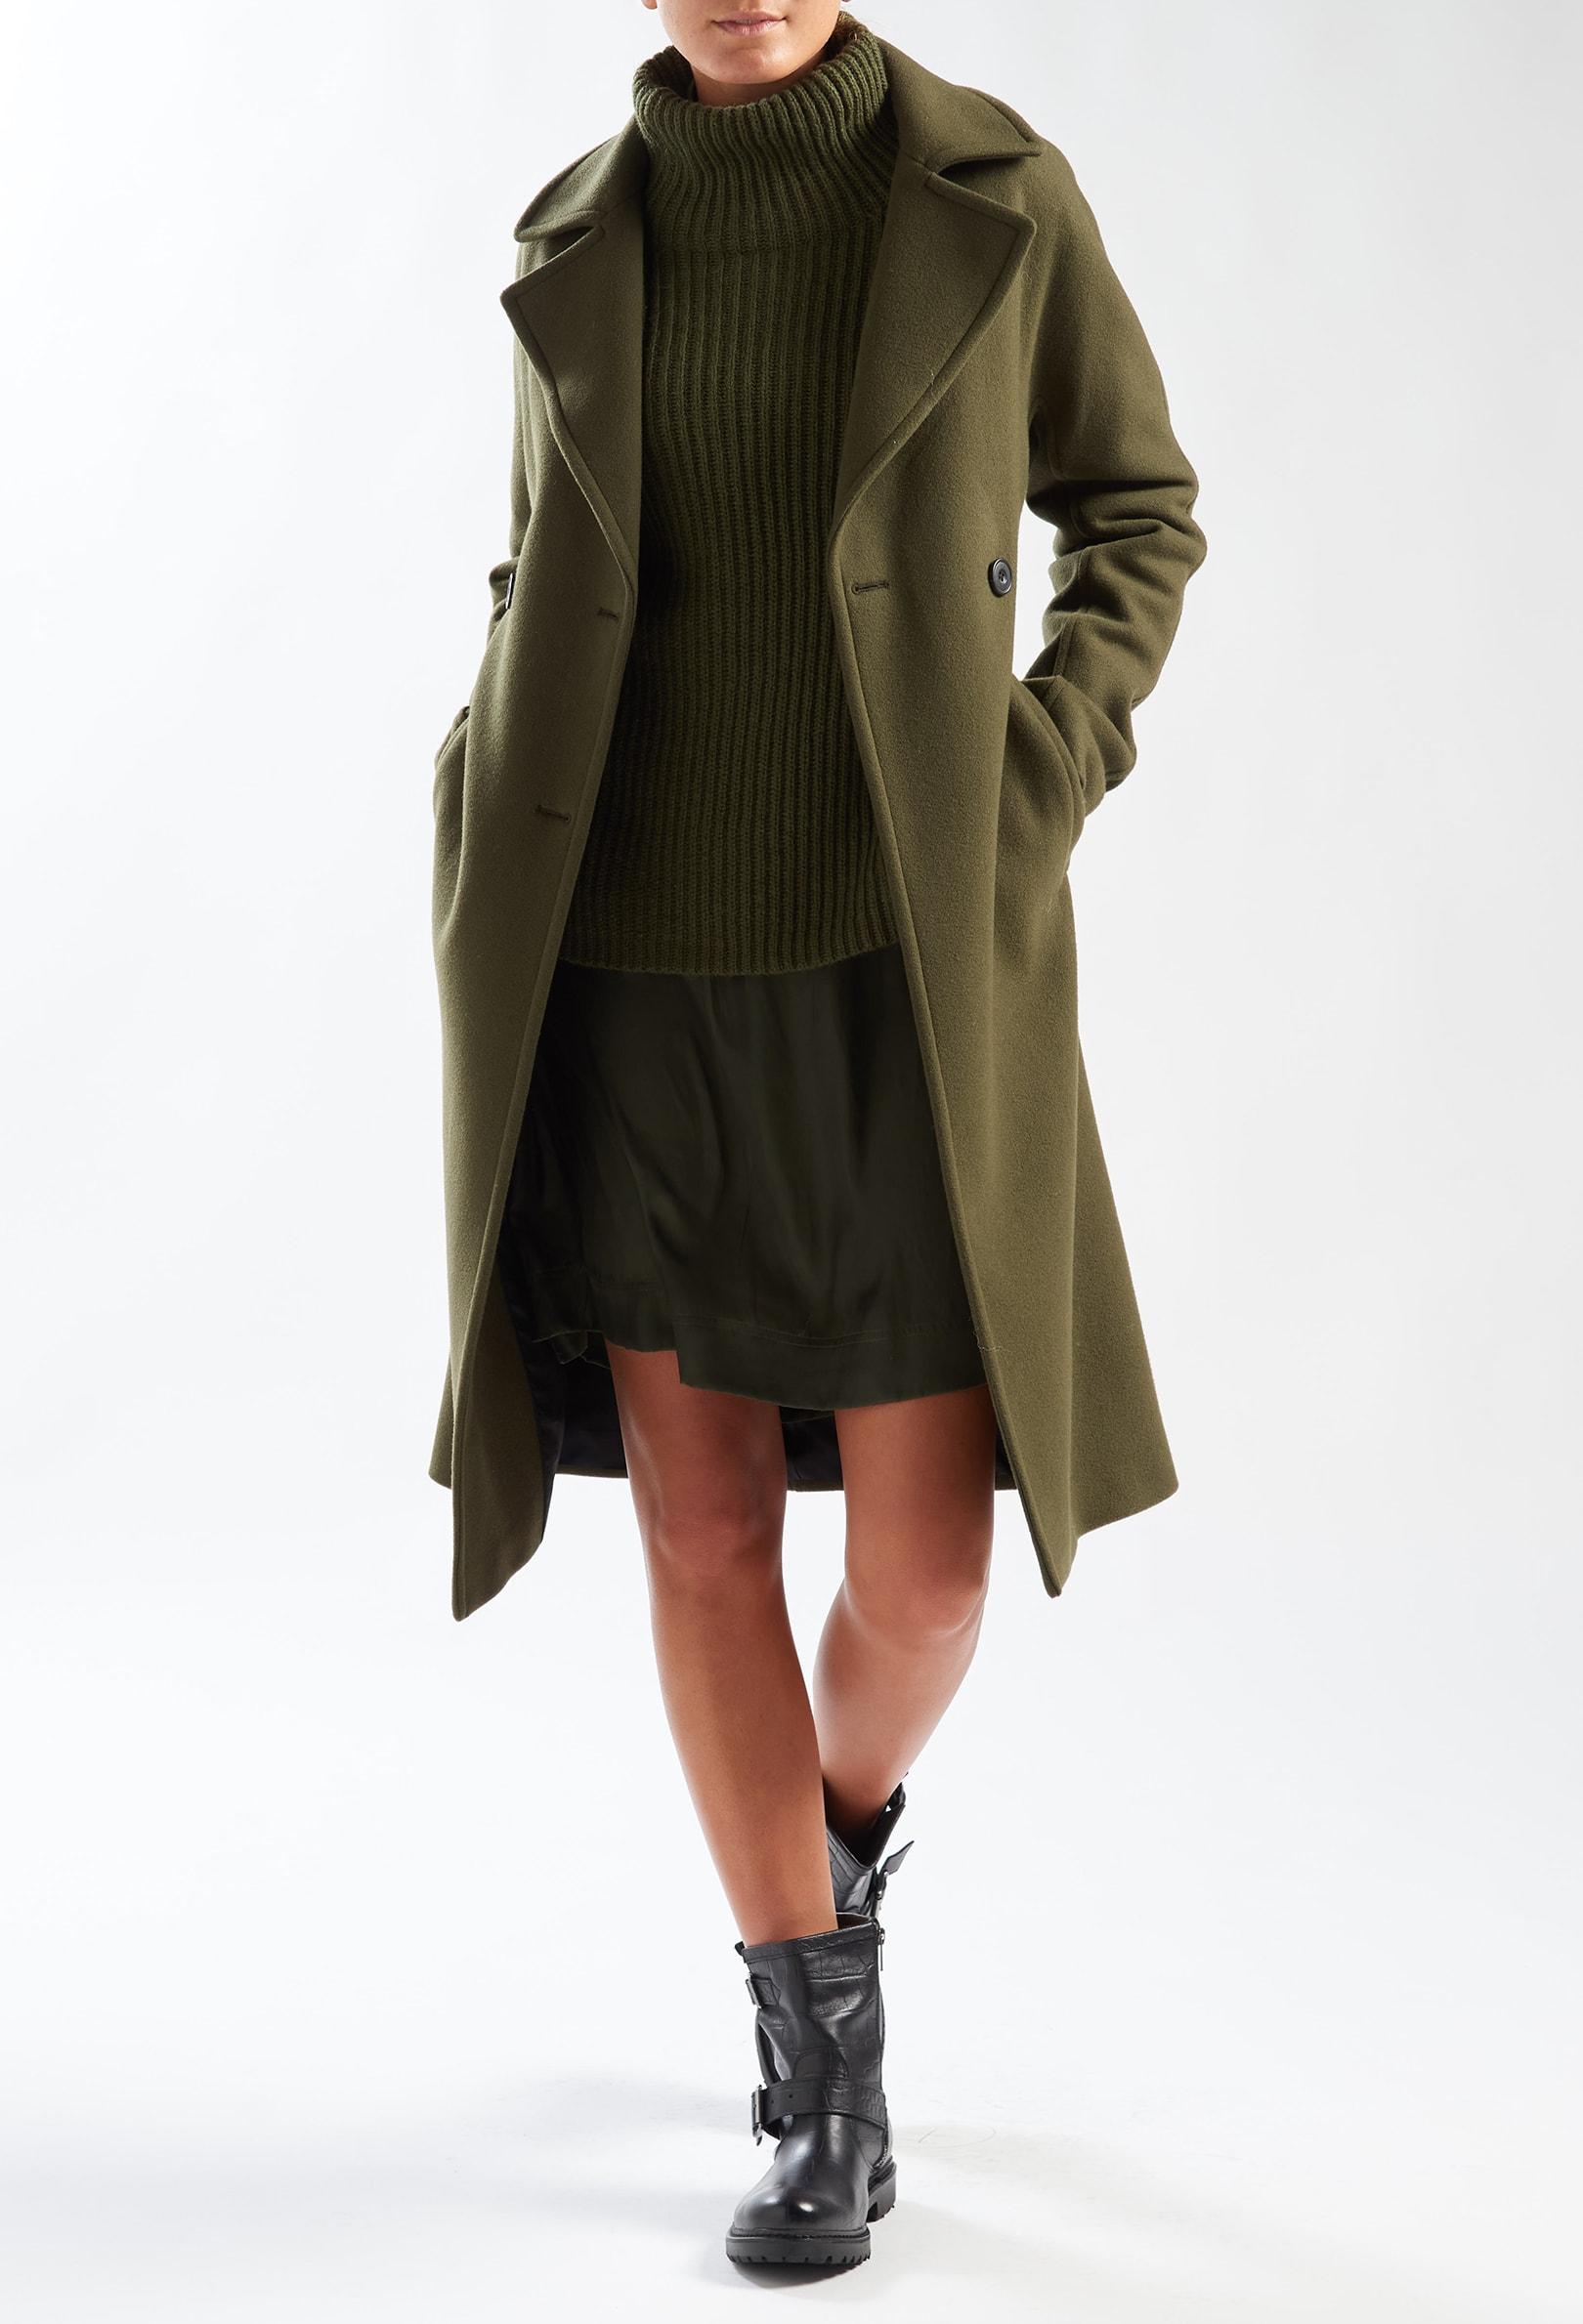 Greens - Look 2